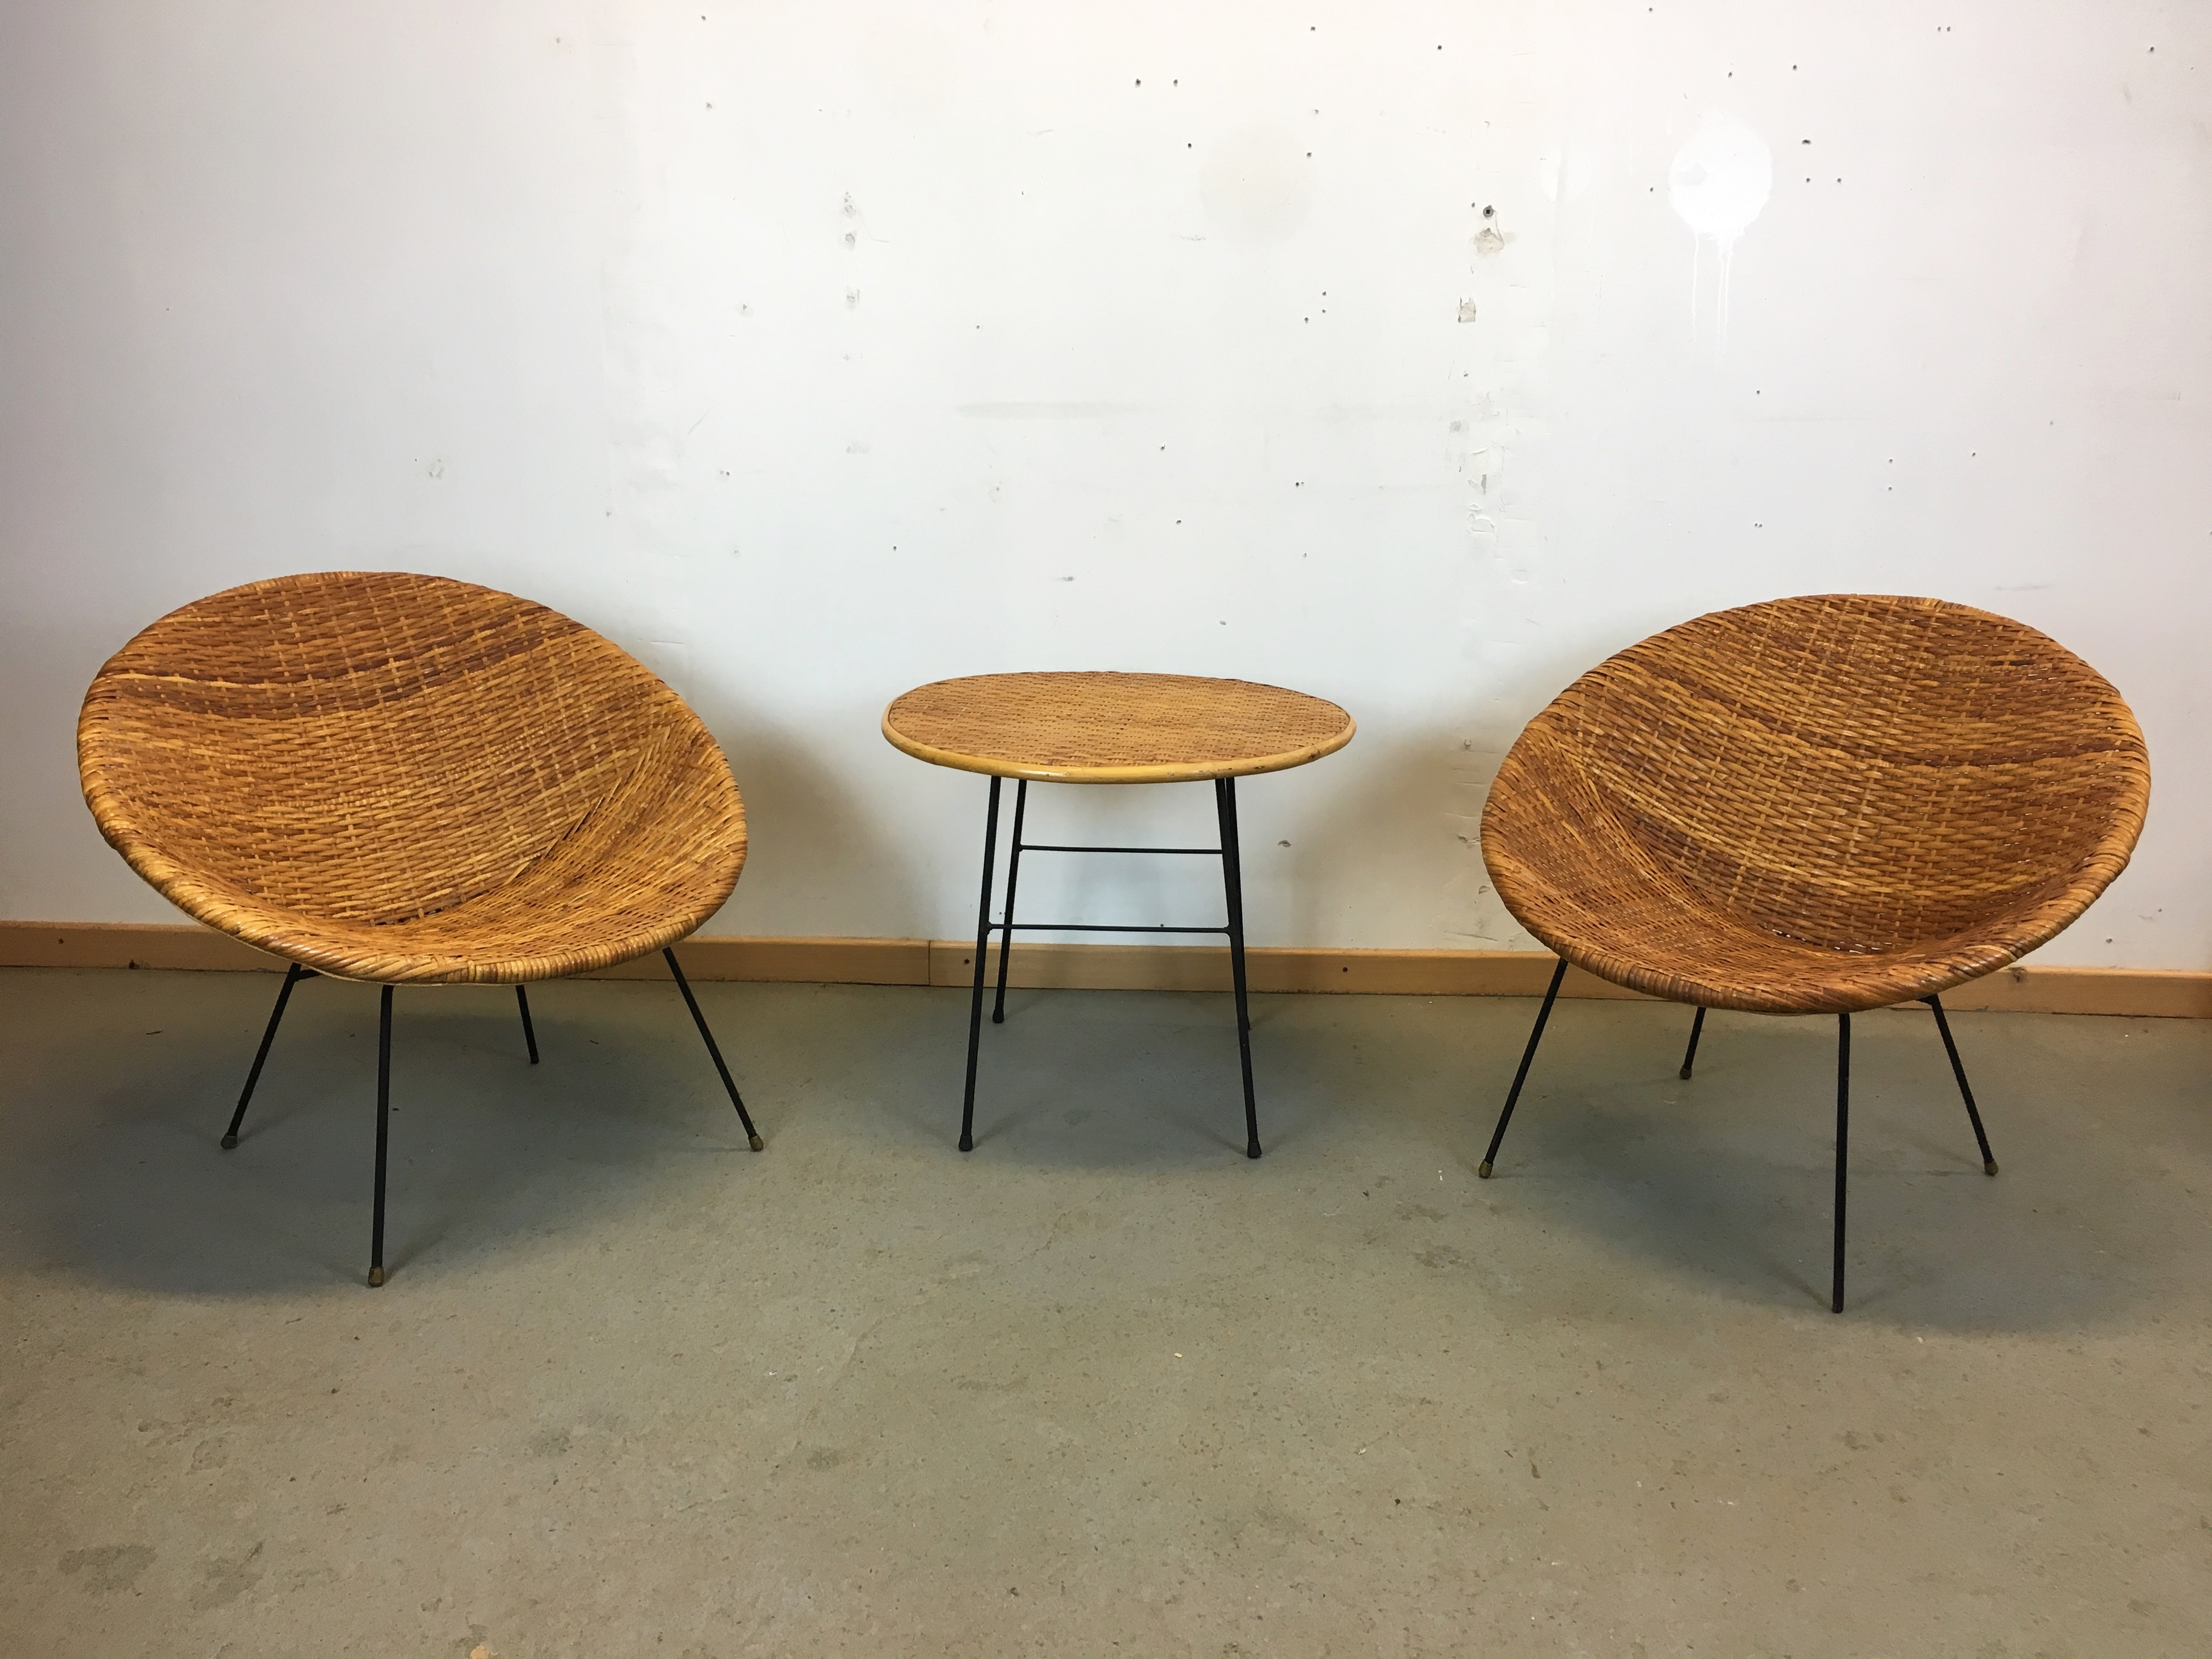 table en osier good table basse rotin lovely rene table basse rotin with table en osier save. Black Bedroom Furniture Sets. Home Design Ideas